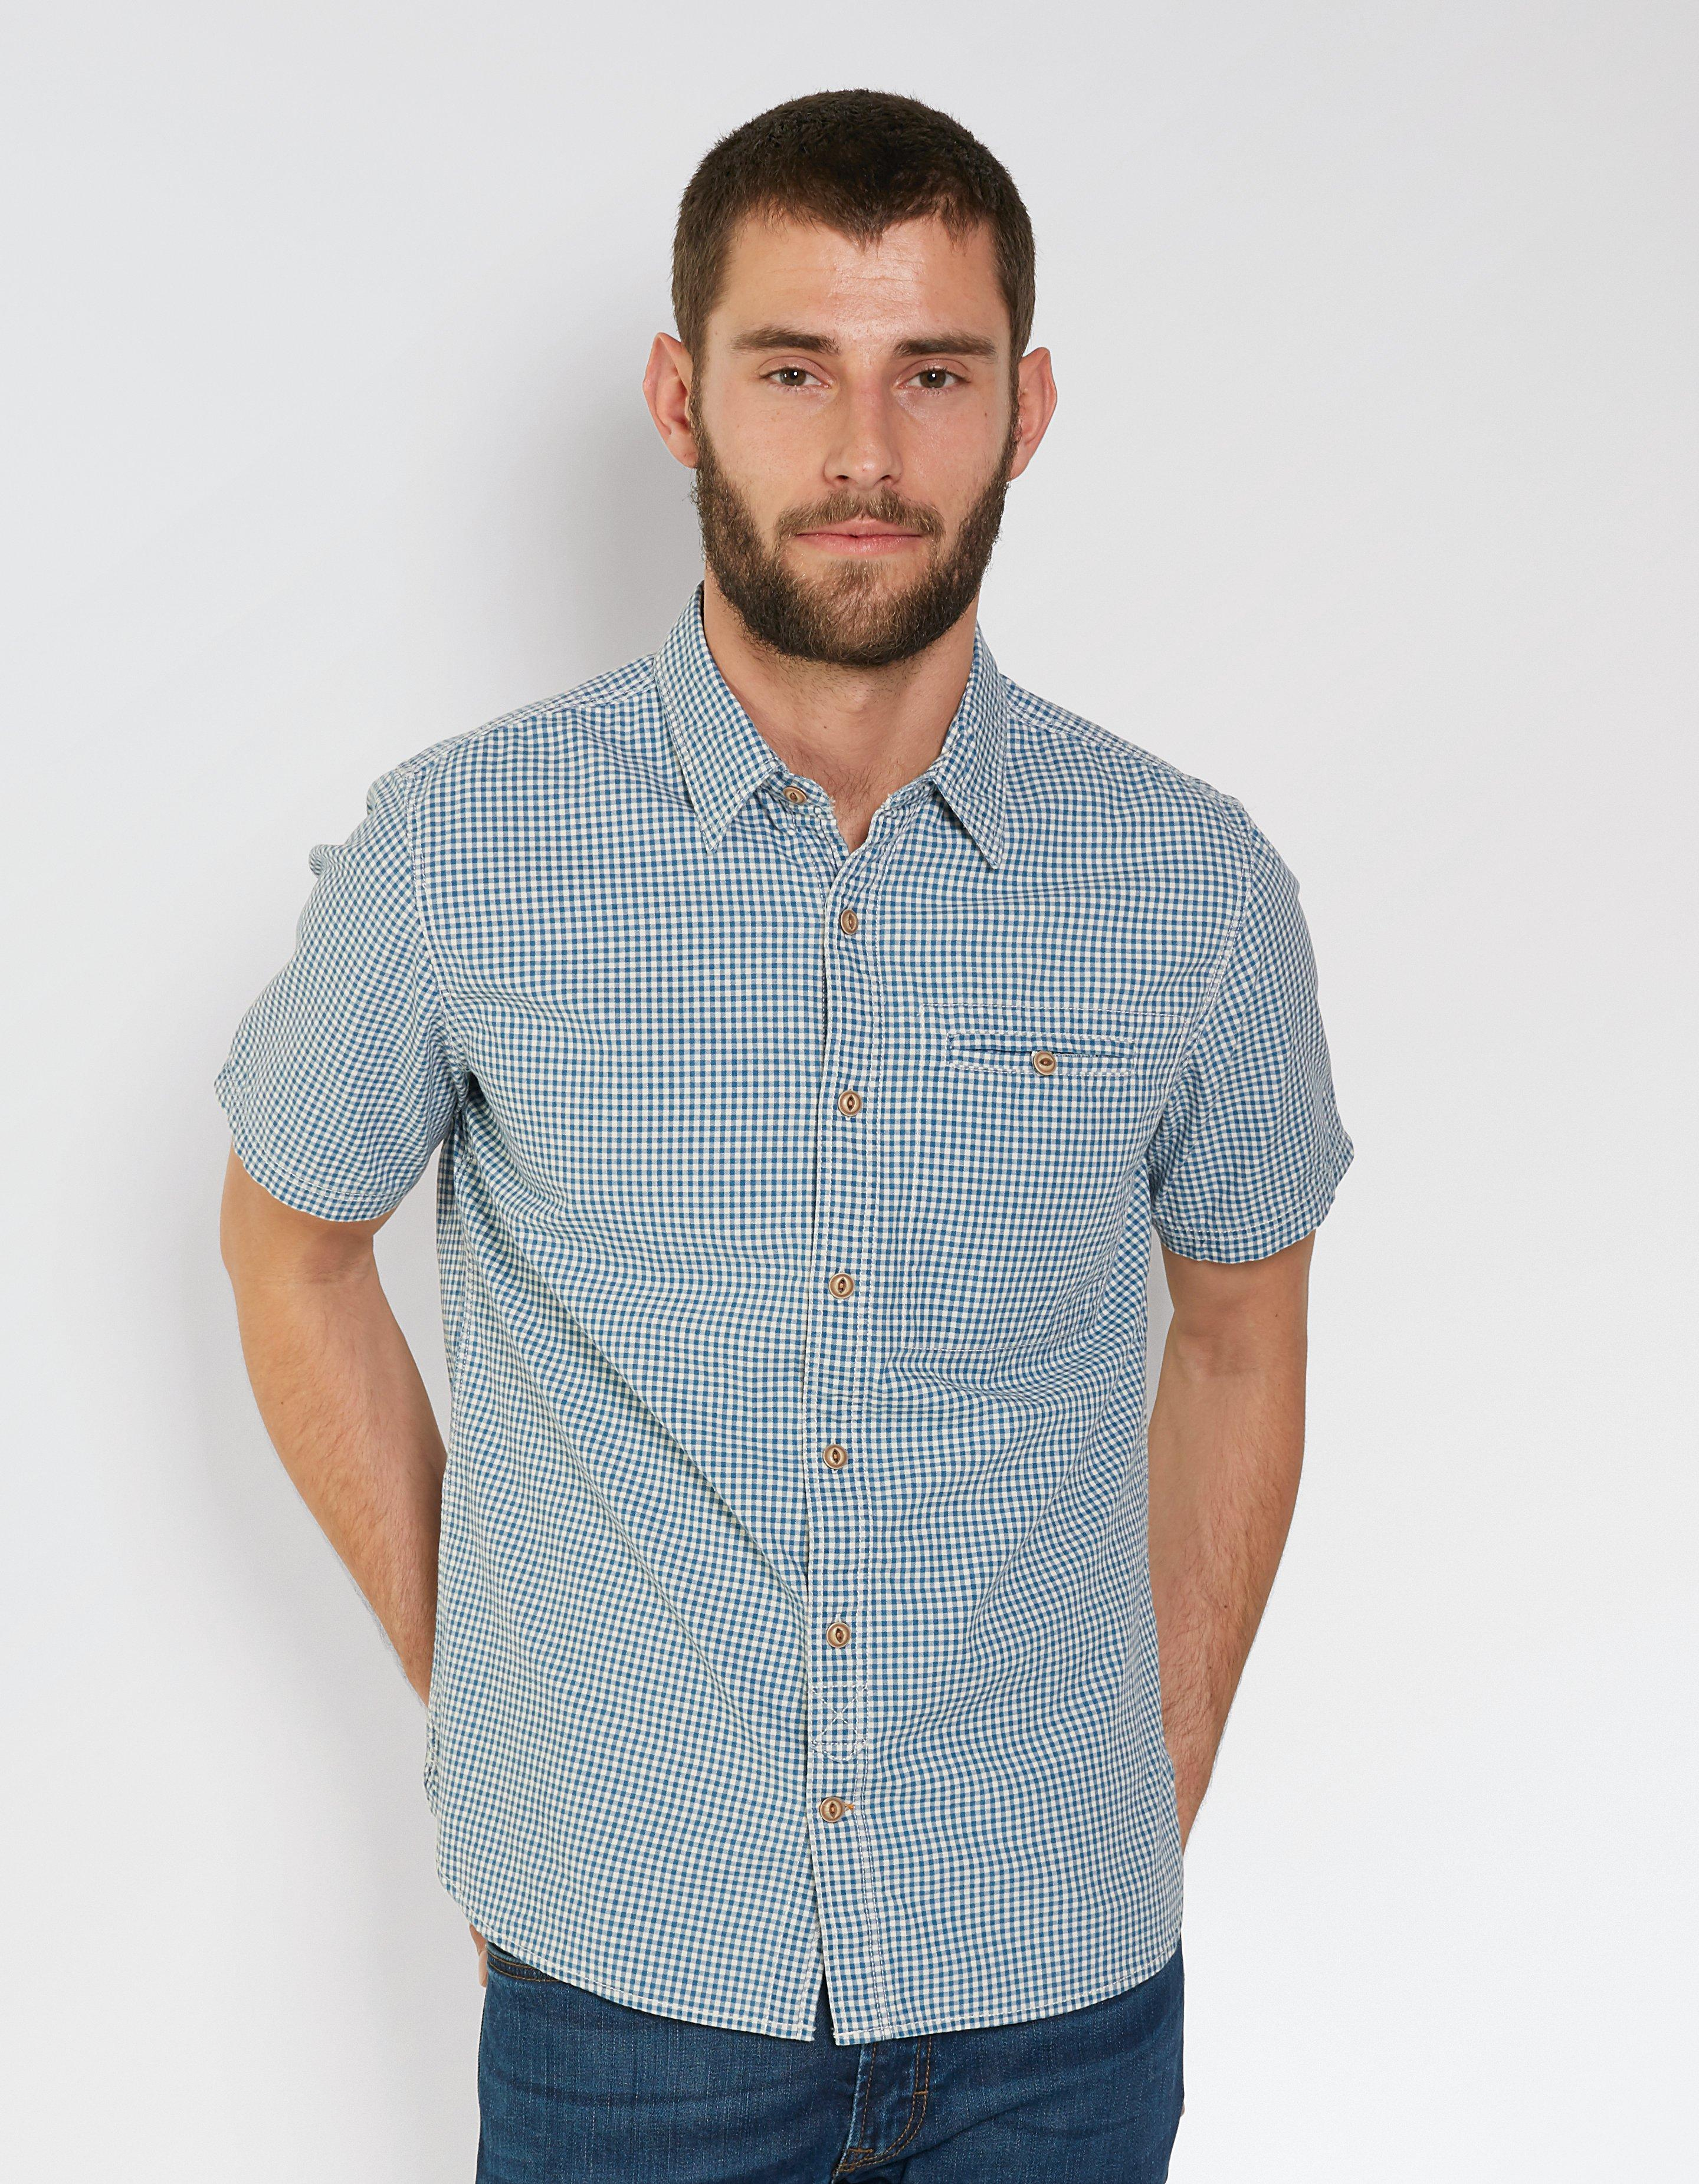 Crowfoot Gingham Shirt